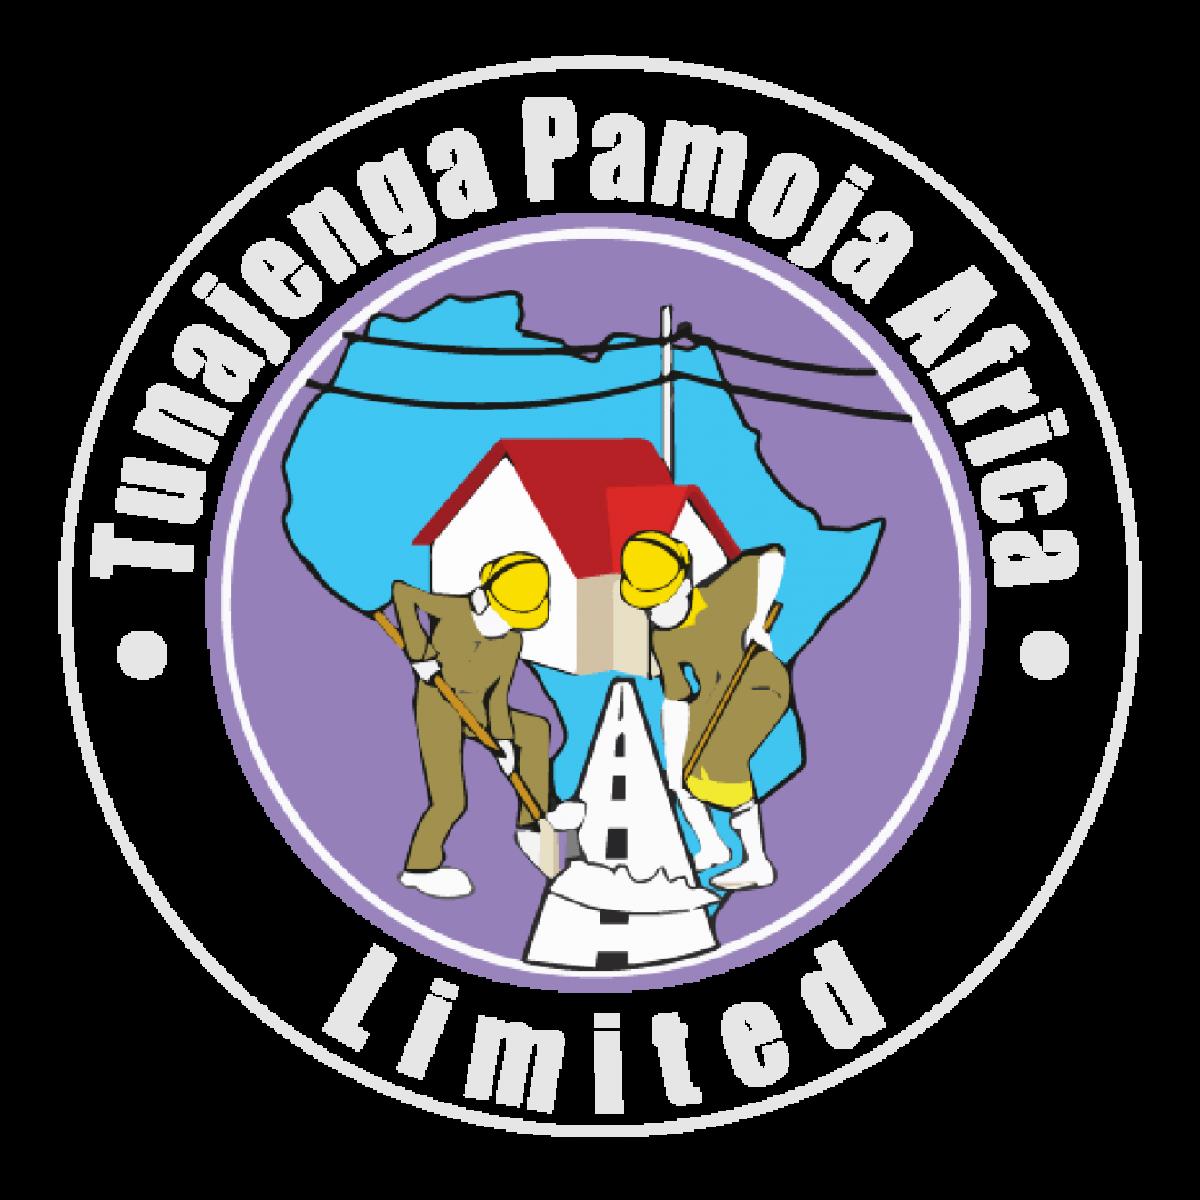 Tunajenga-LogoArtboard 1-8